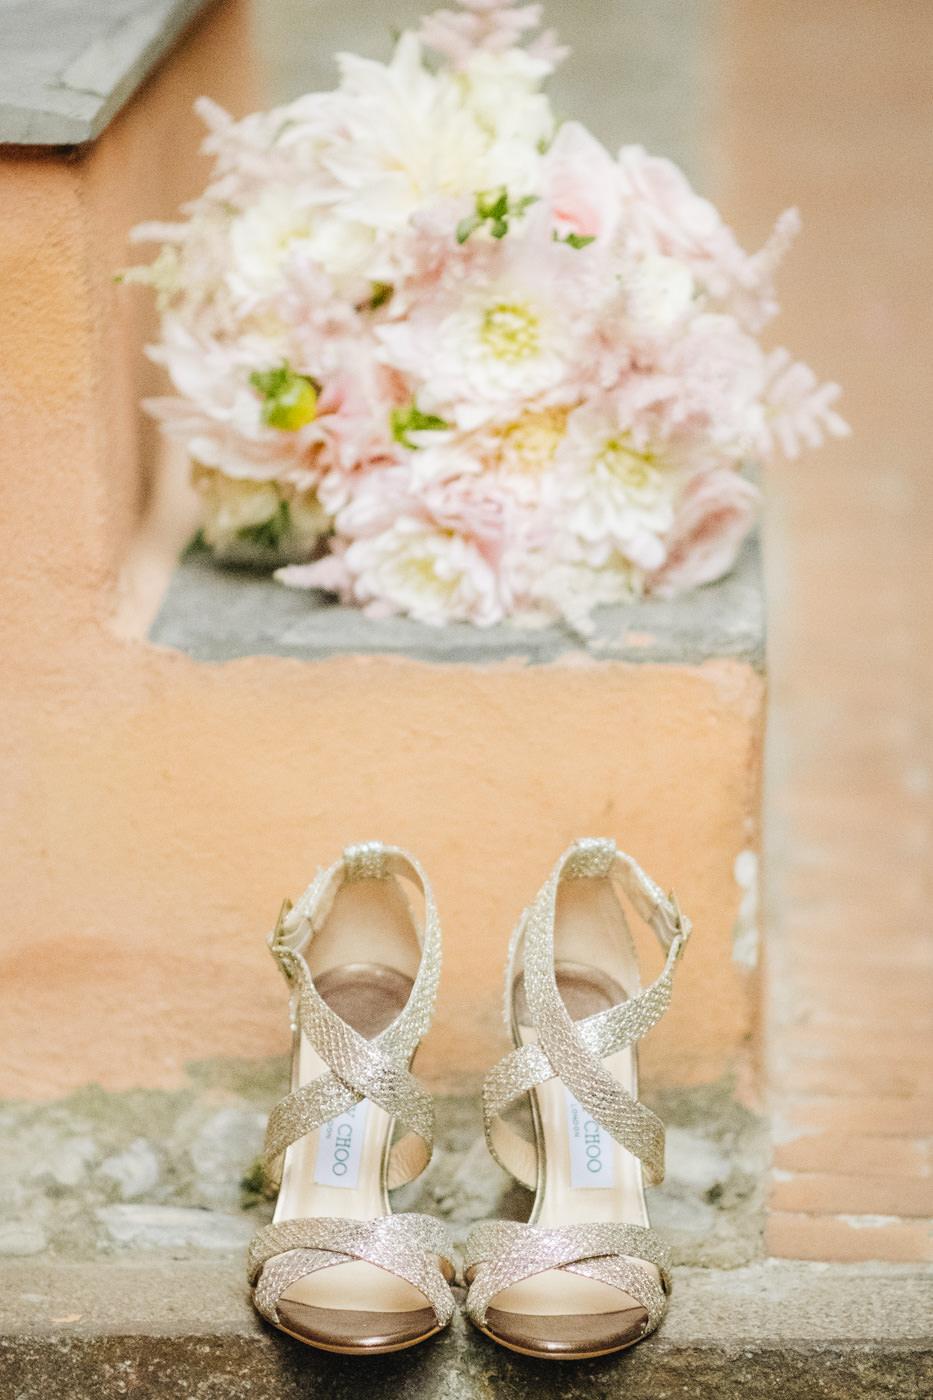 matrimoni_all_italiana_fotografo_matrimonio_cinque_terre-6.jpg